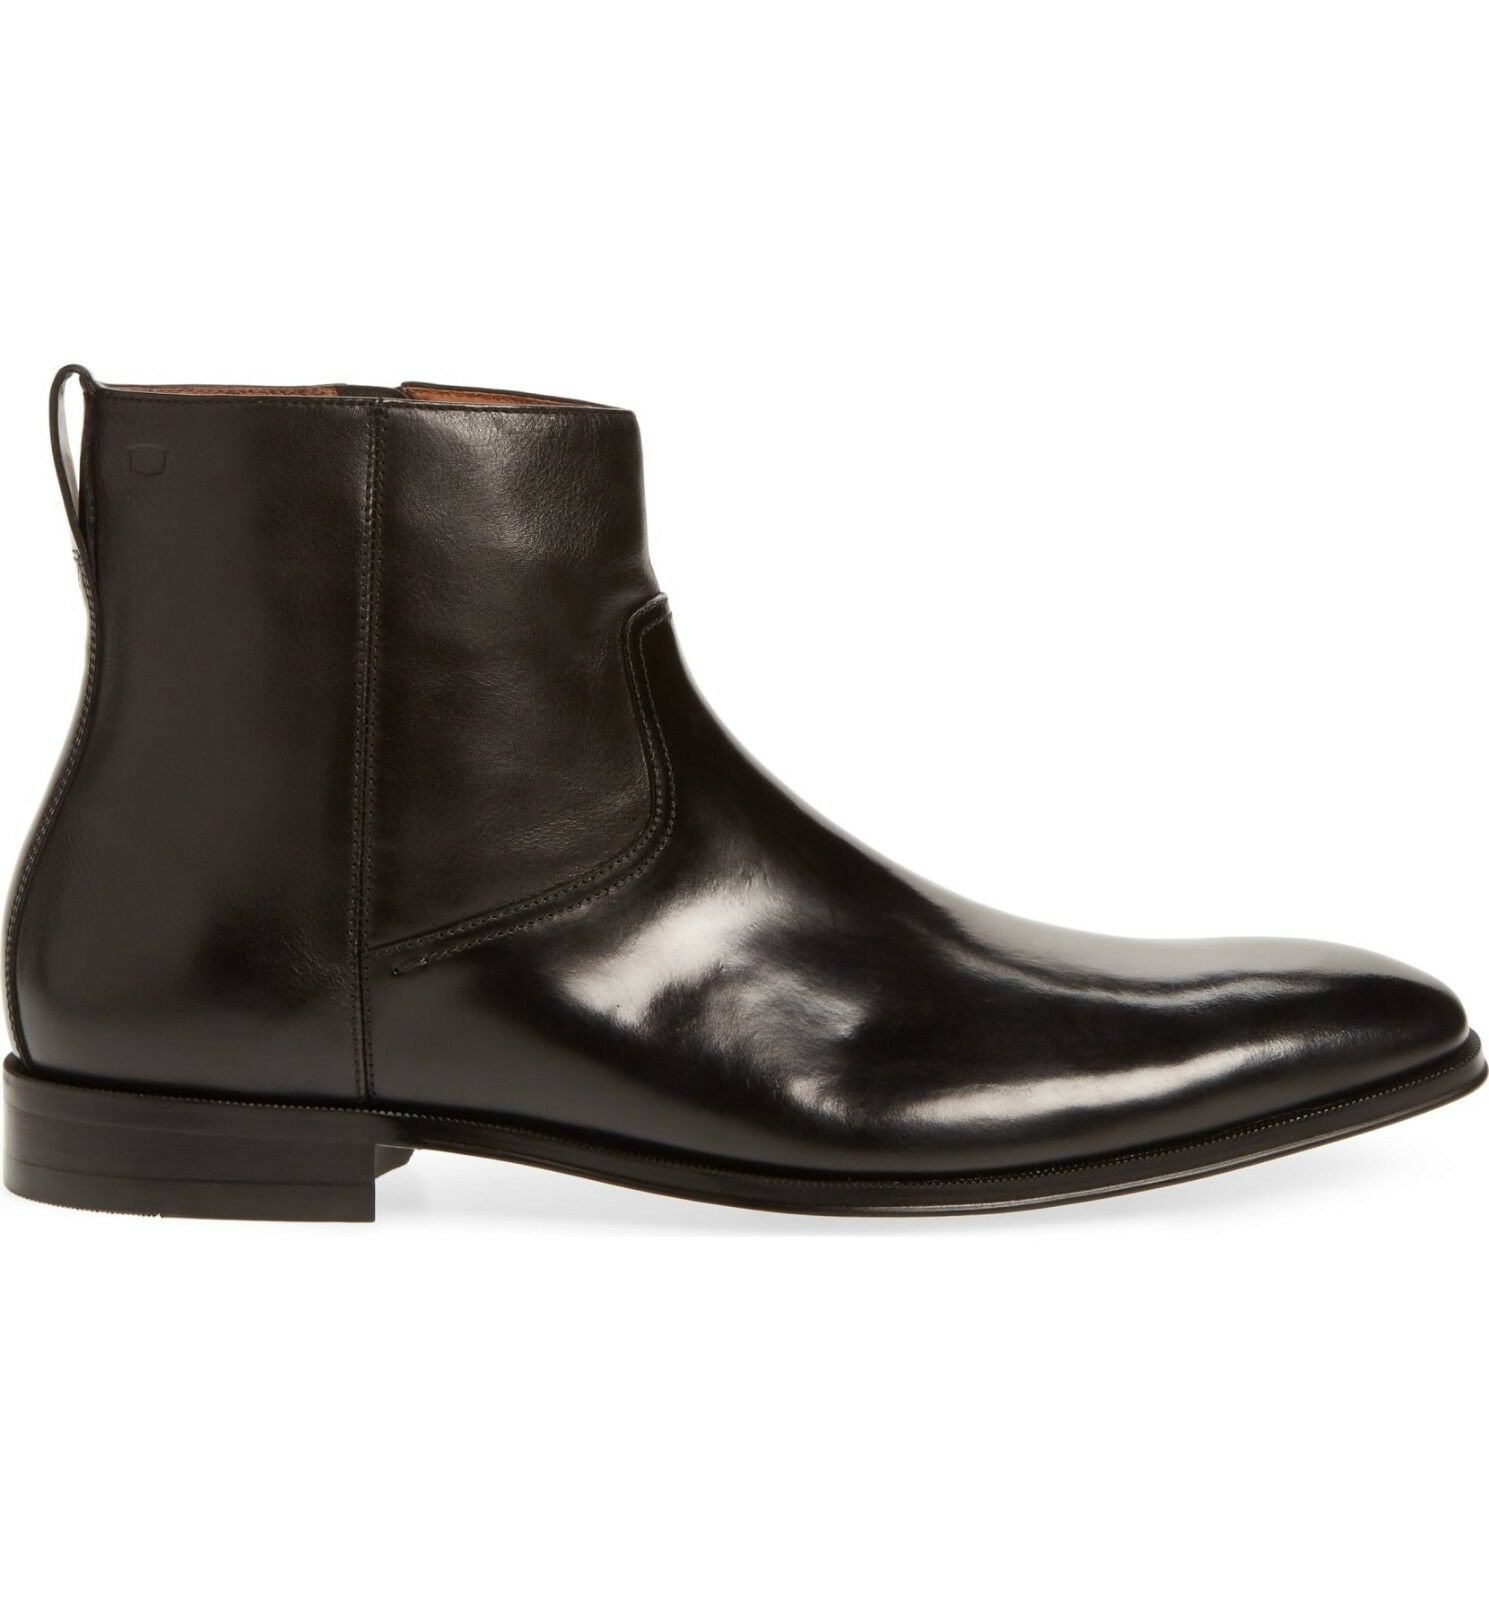 Florsheim BELFAST ZIP Uomo nero nero nero 14230-001 Leather Side Zip Up Dress stivali 925089